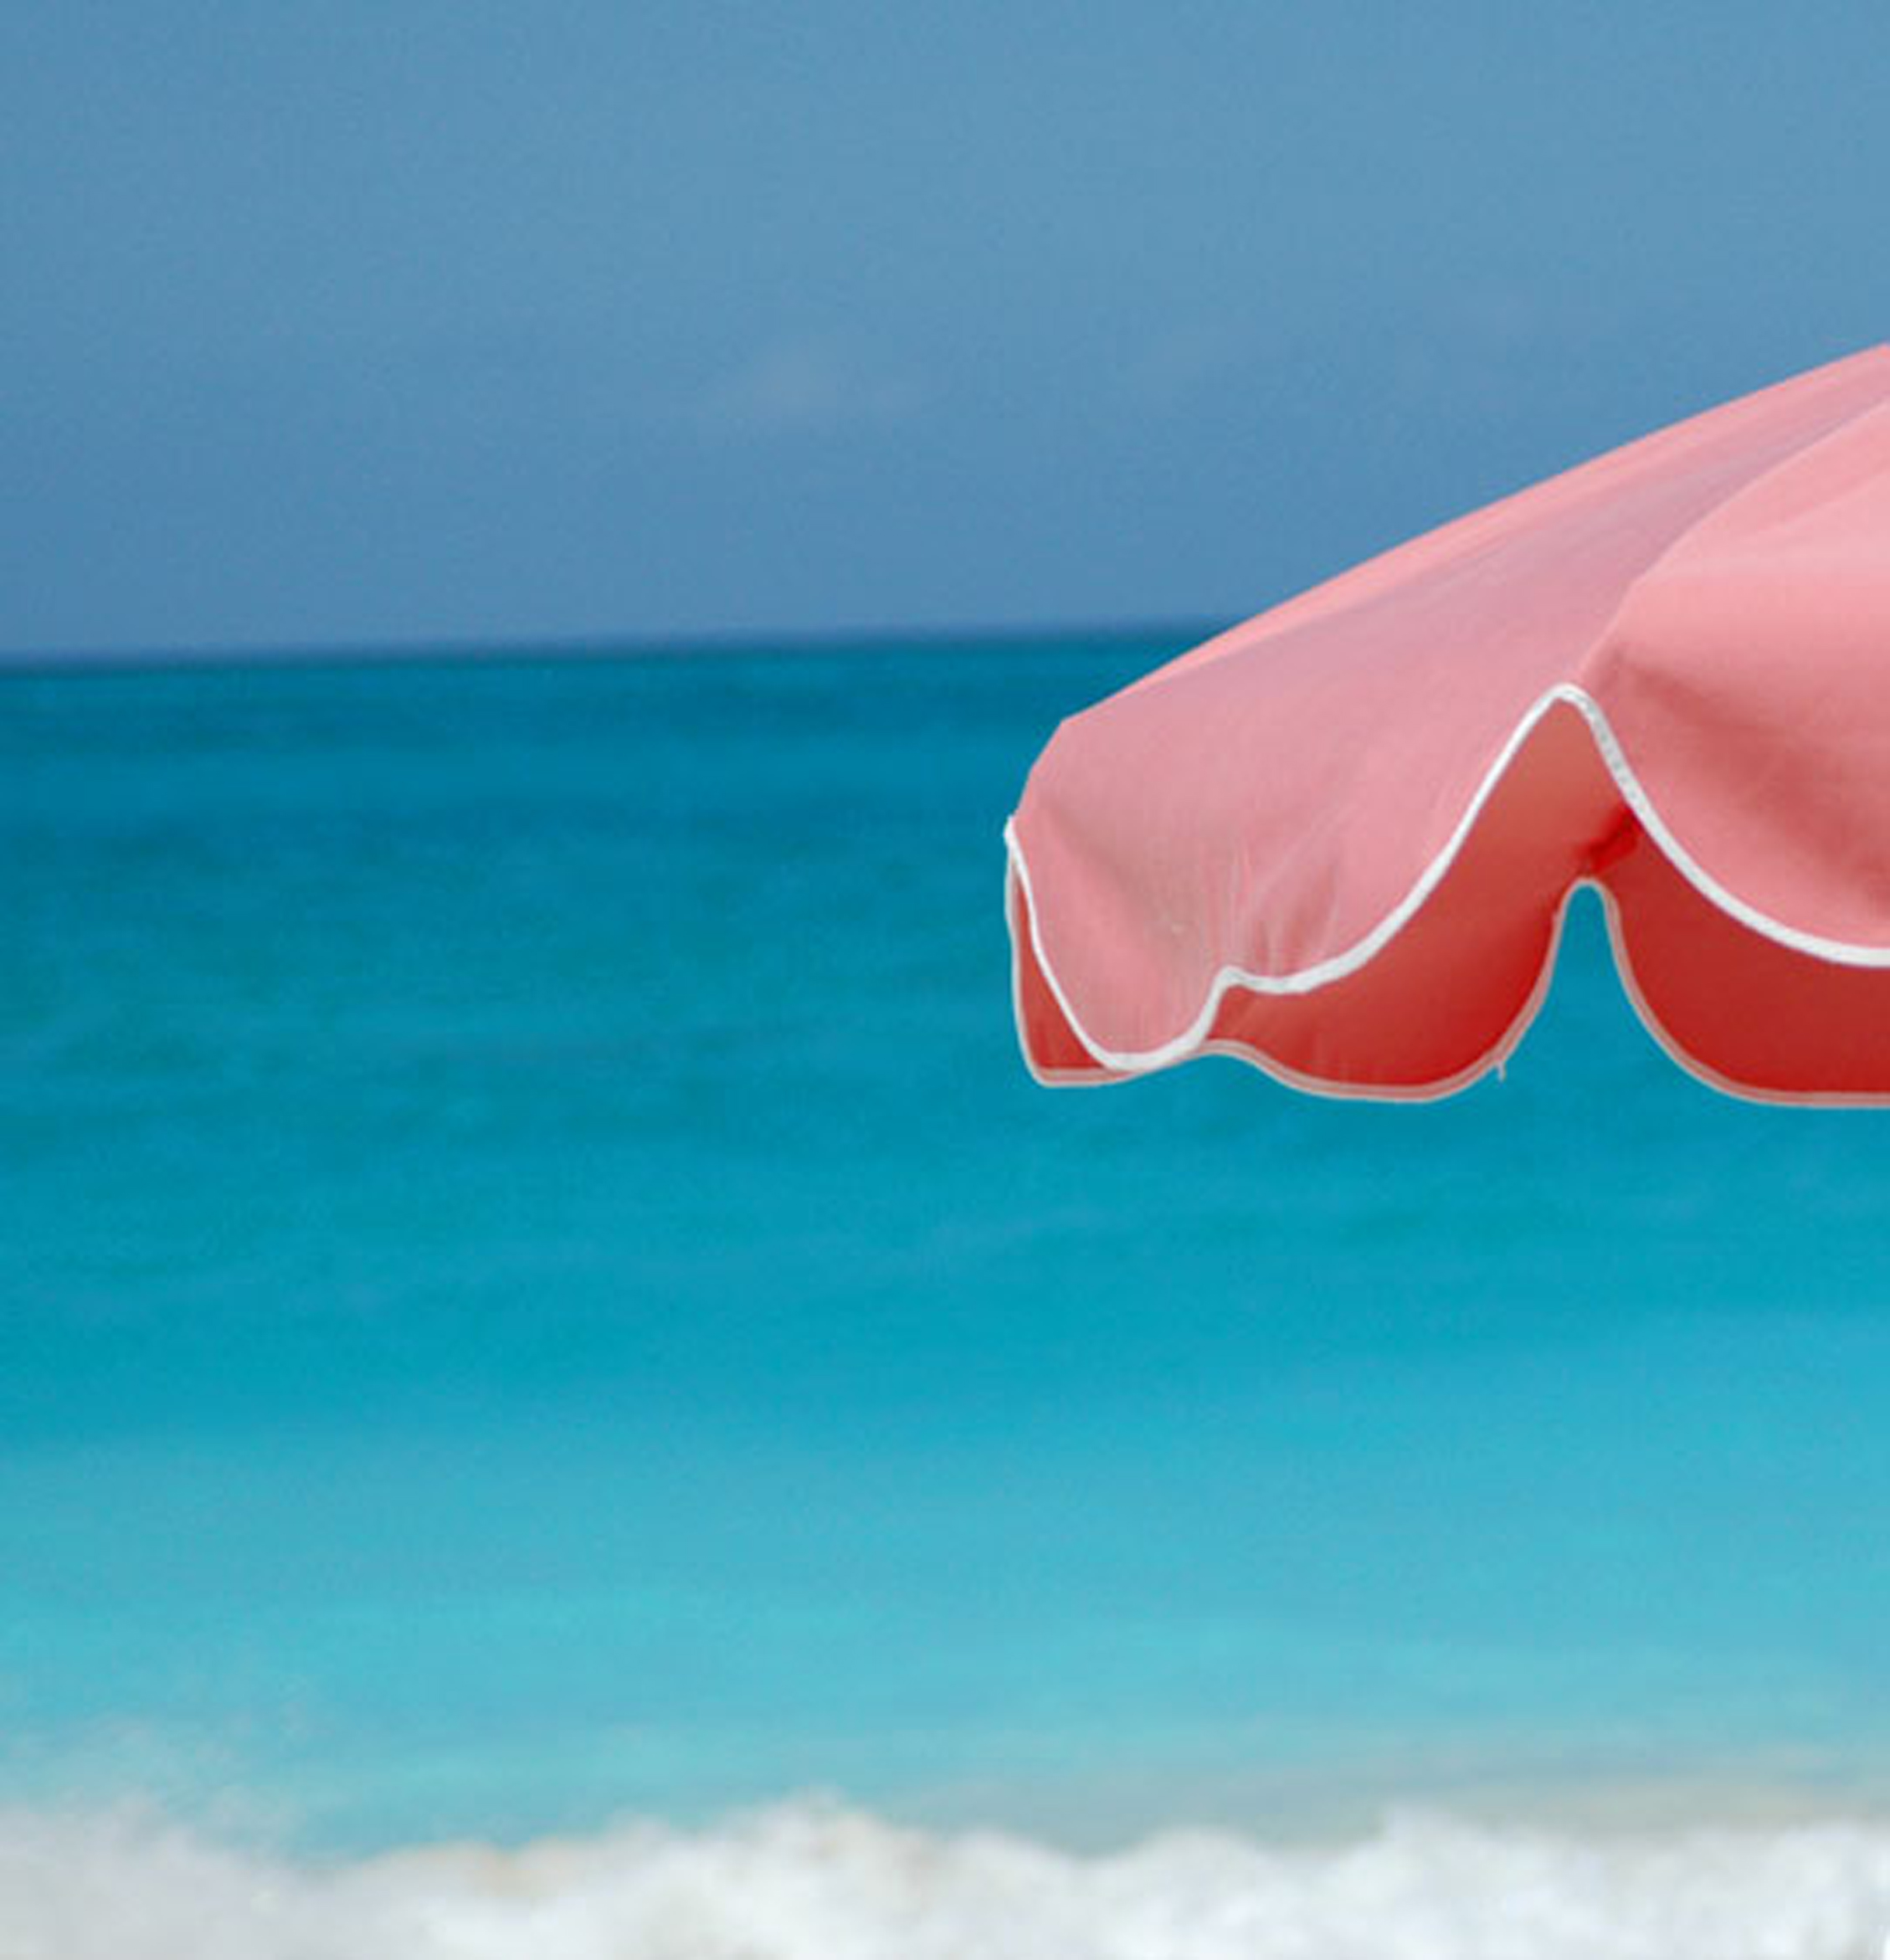 umbrella abstract.jpg